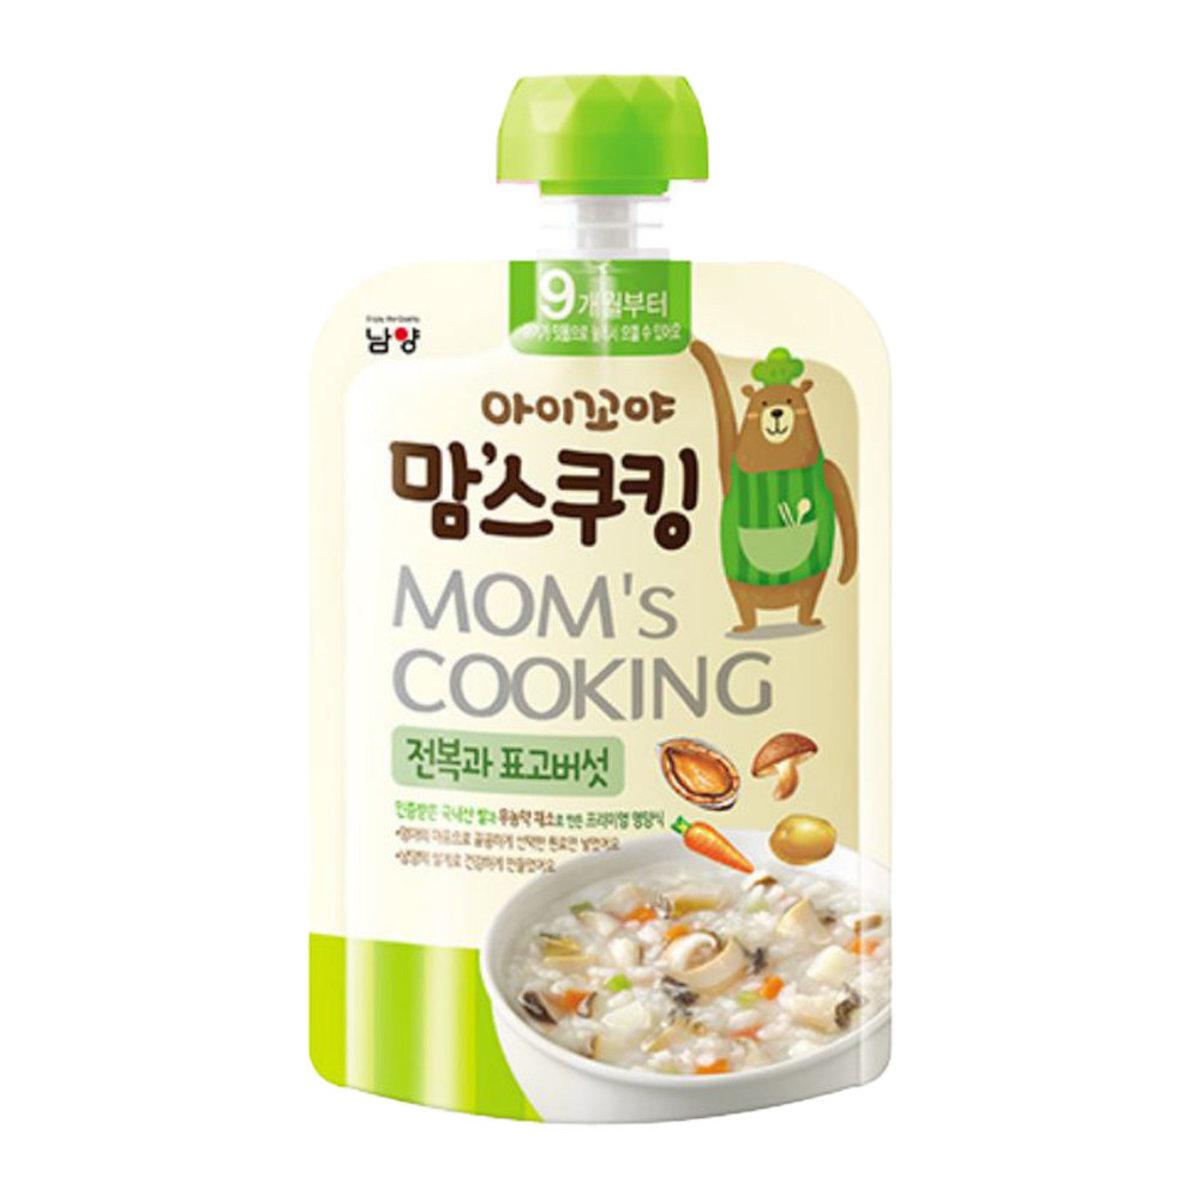 Mom's Cooking - Abalone & Mushroom Porridge